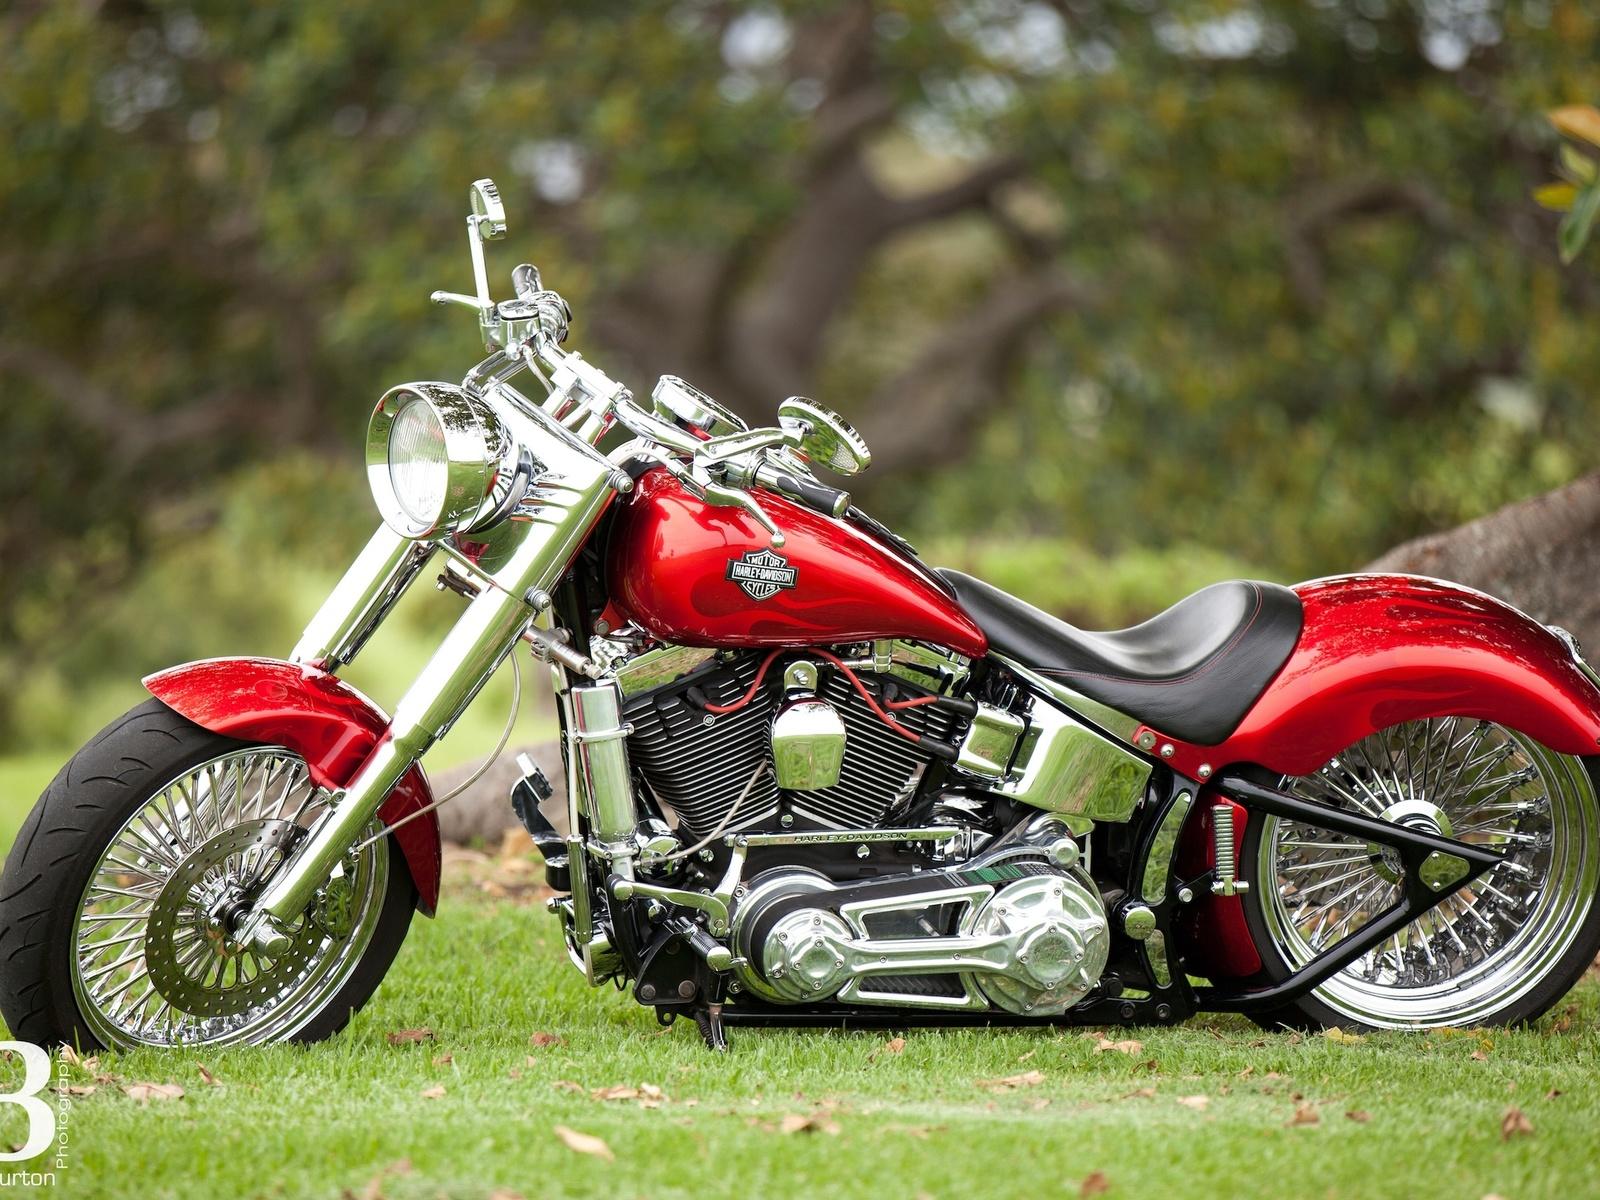 мотоцикл, harley davidson, red, хром